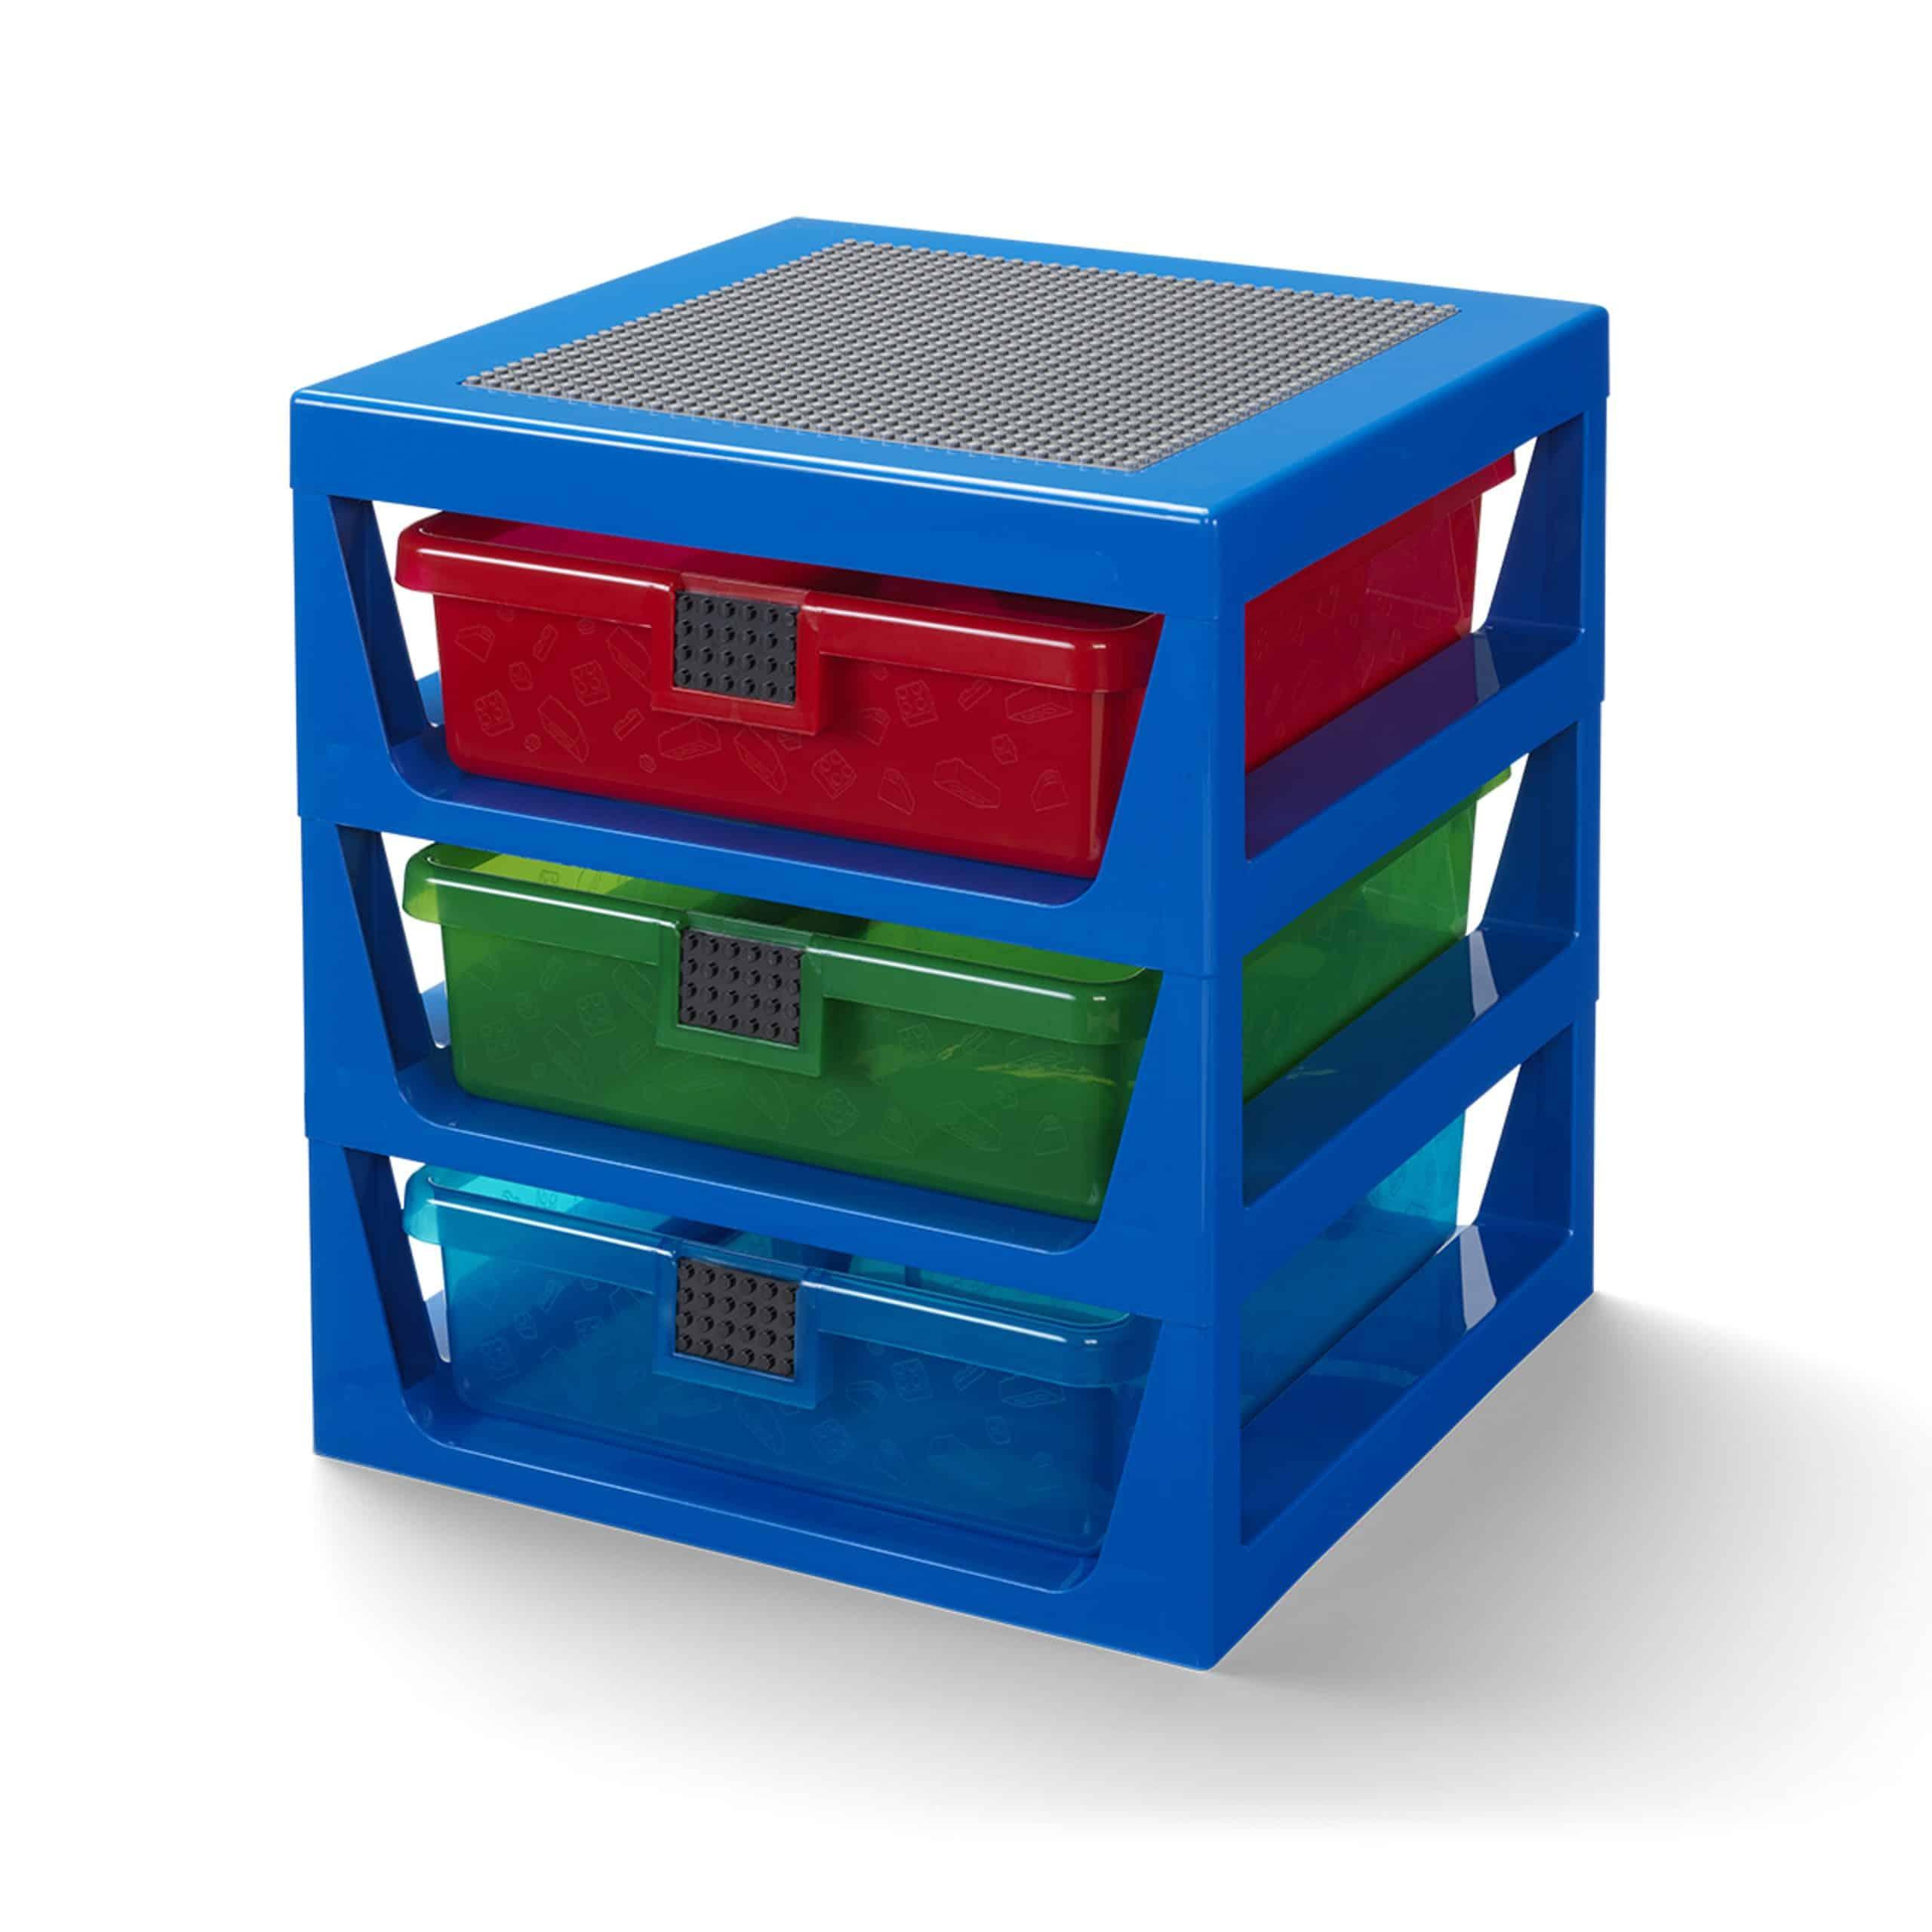 lego 5006179 regalsystem in transparentem blau scaled